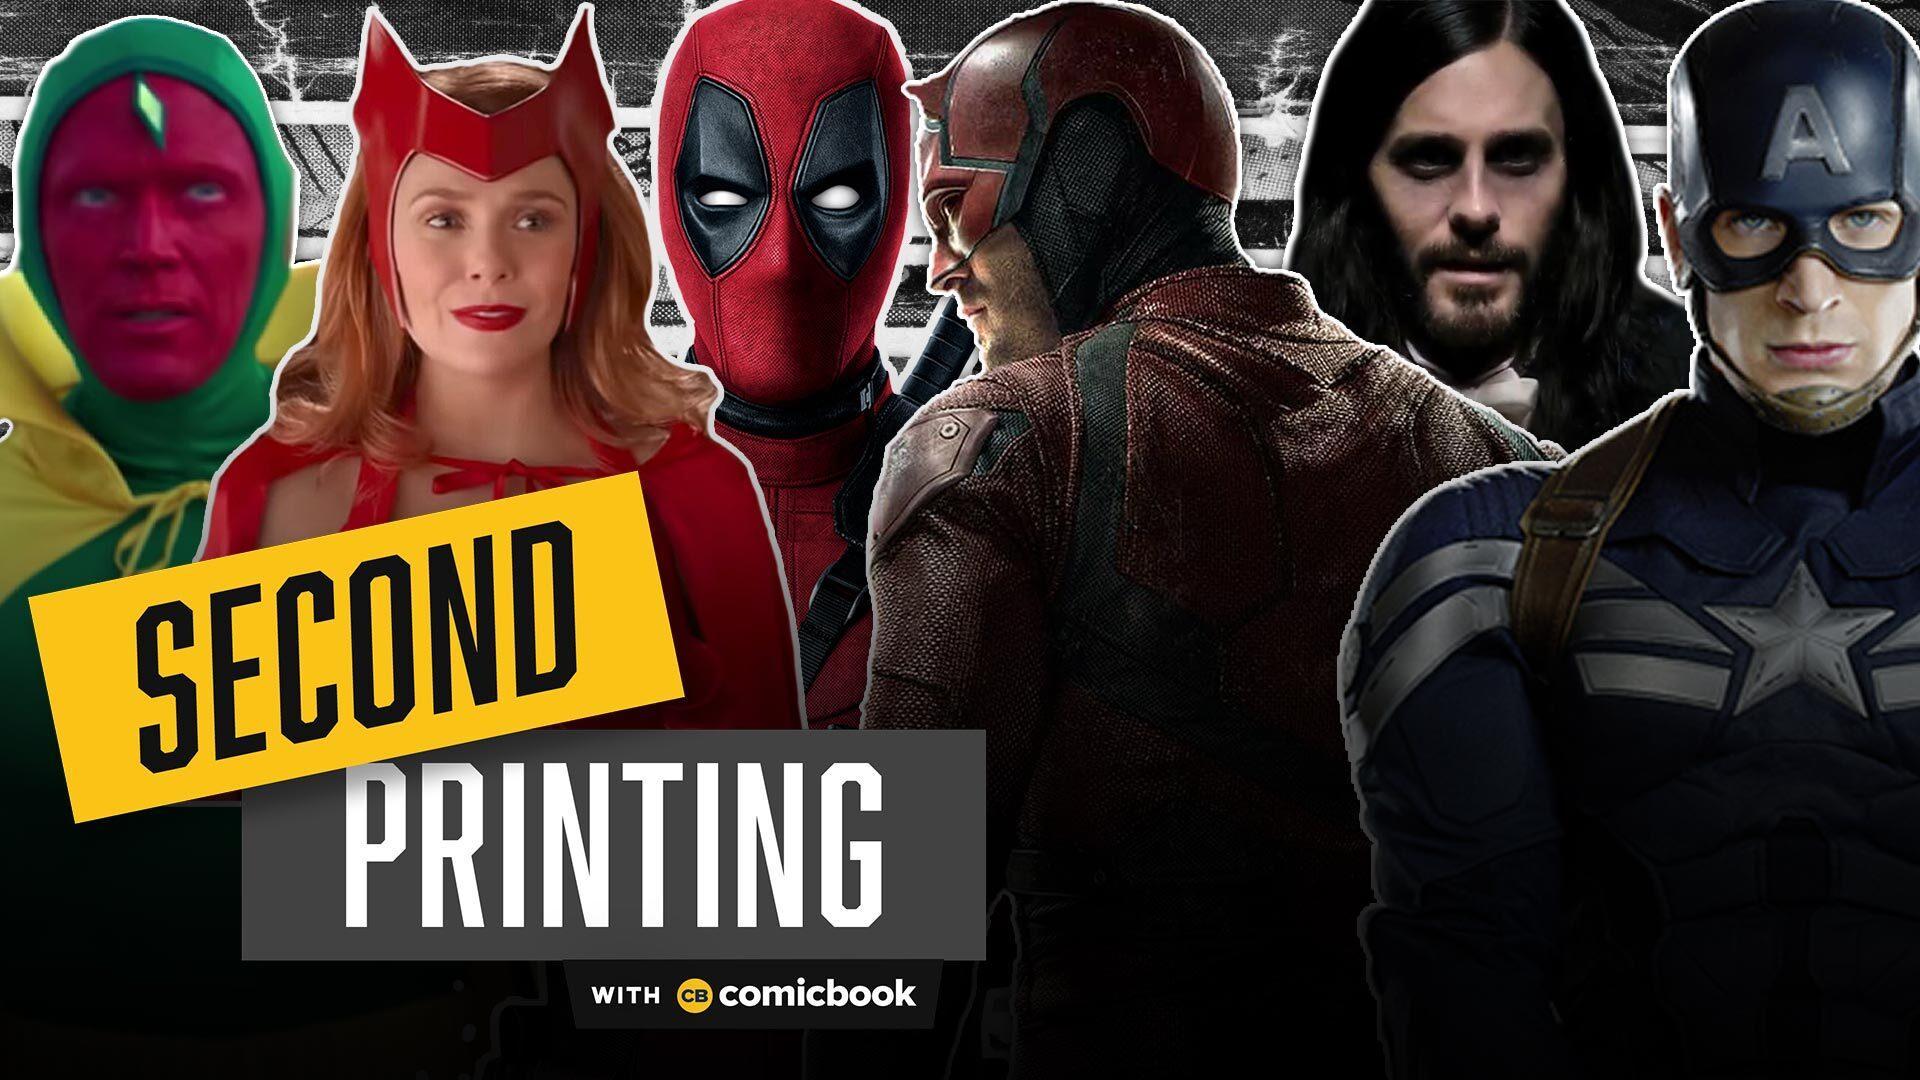 Second Printing - January 16, 2020